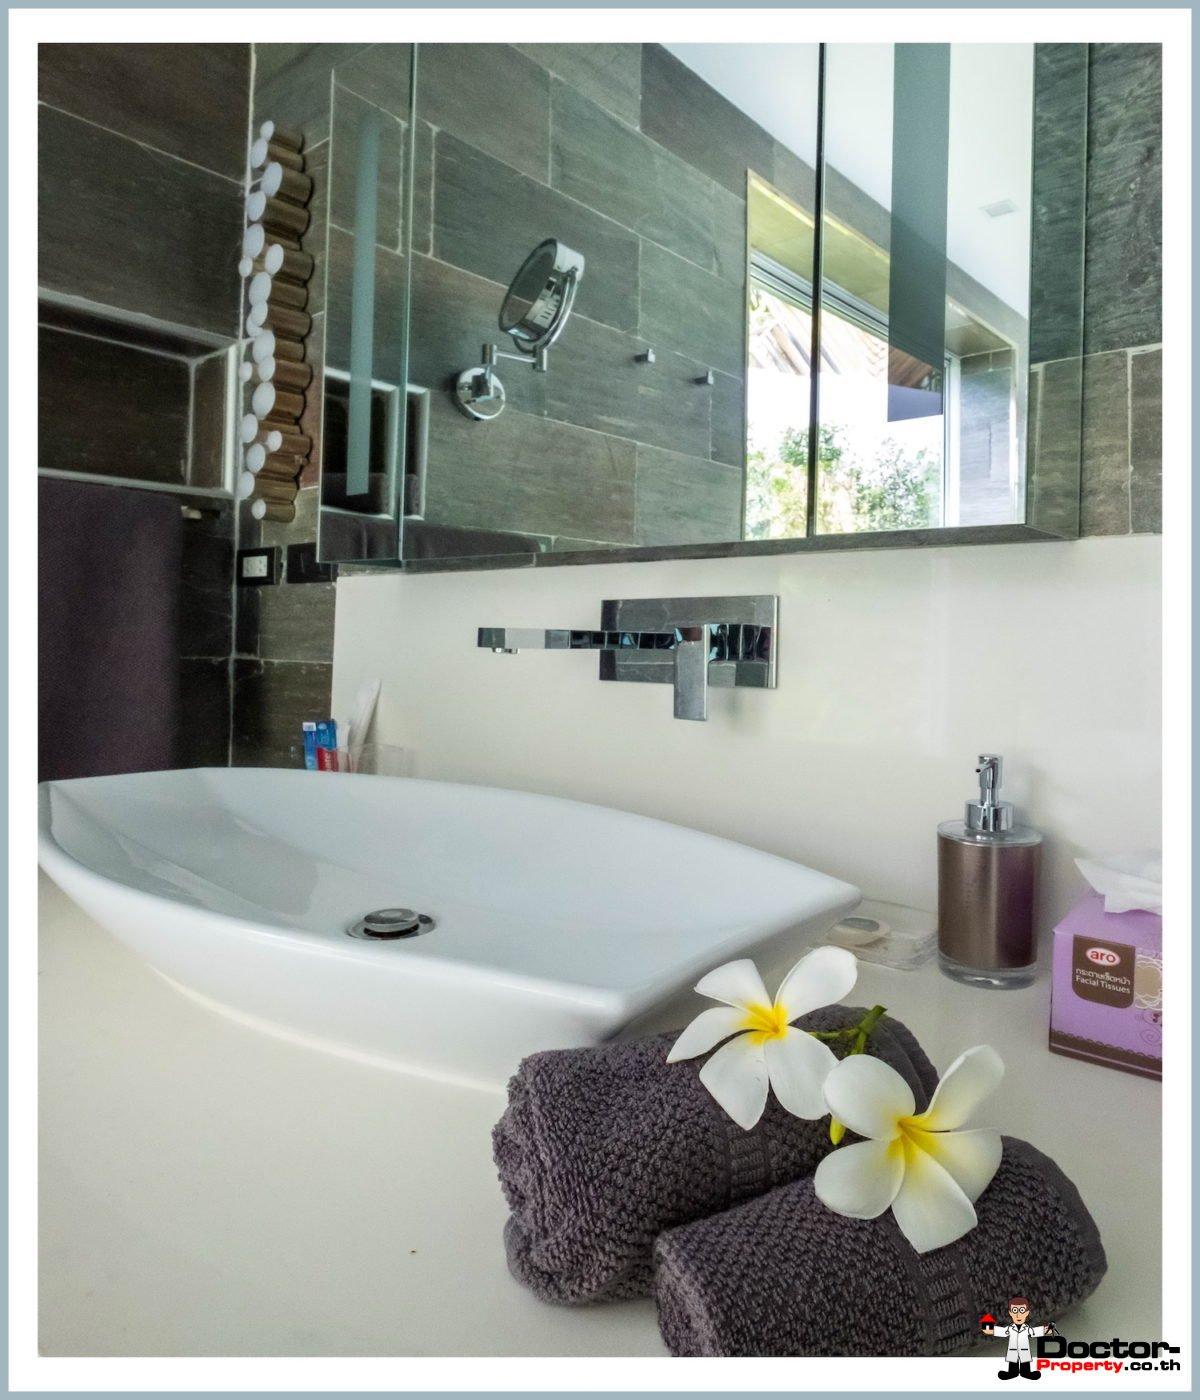 Stunning 4 Bedroom Pool Villa with Seaview- Mae Nam, Koh Samui - For Sale